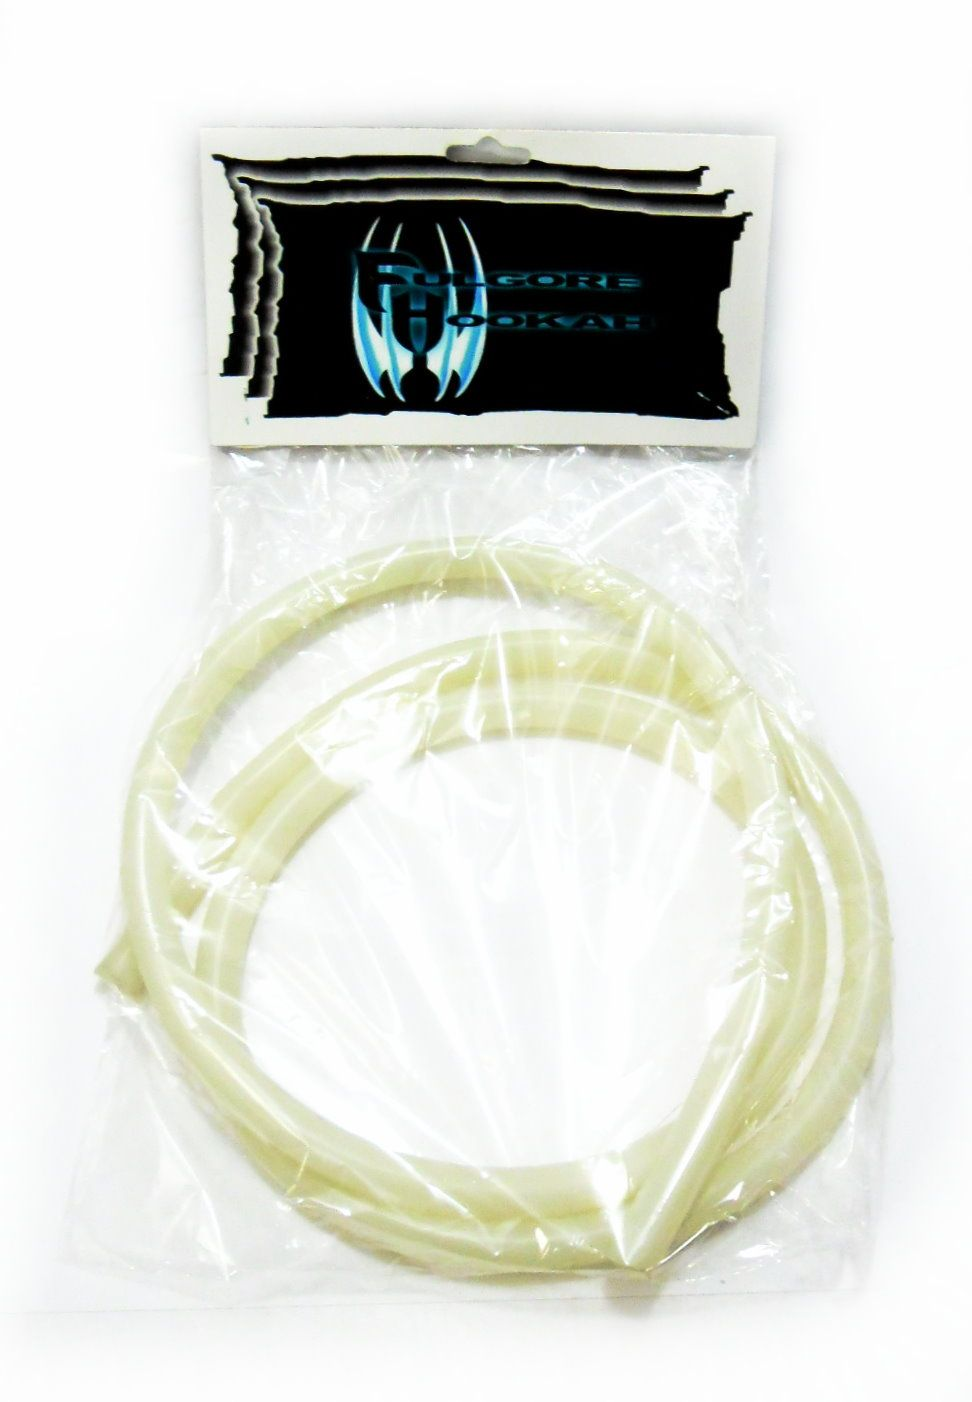 Mangueira p/narguile FLUORESCENTE silicone antichamas BRANCO NEON( brilha no escuro)1,60m s/piteiras